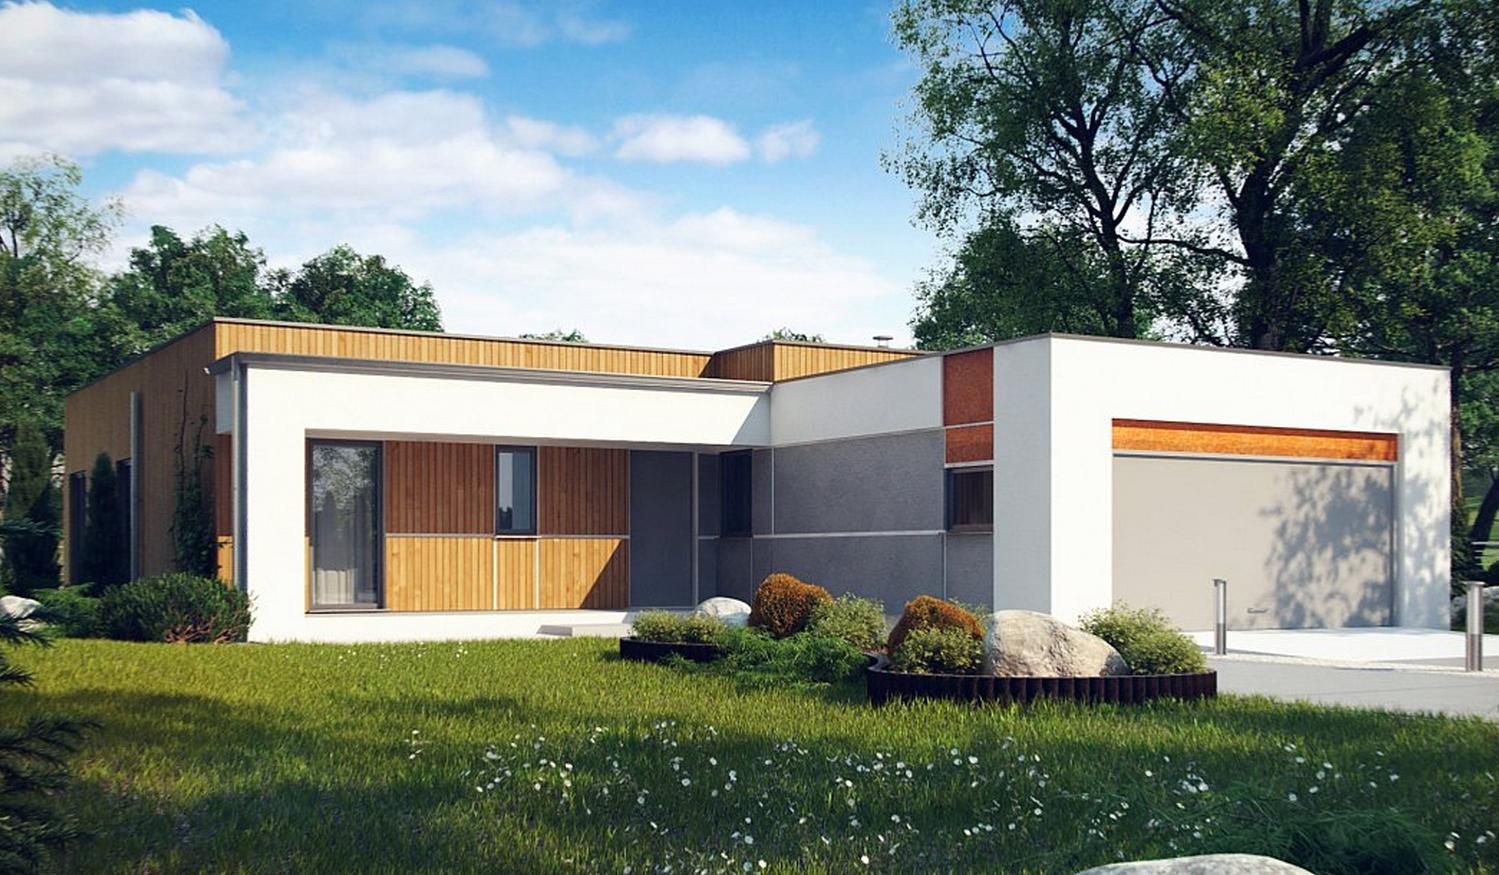 Fabricant maisons bois pologne ventana blog for Fabricant maison bois